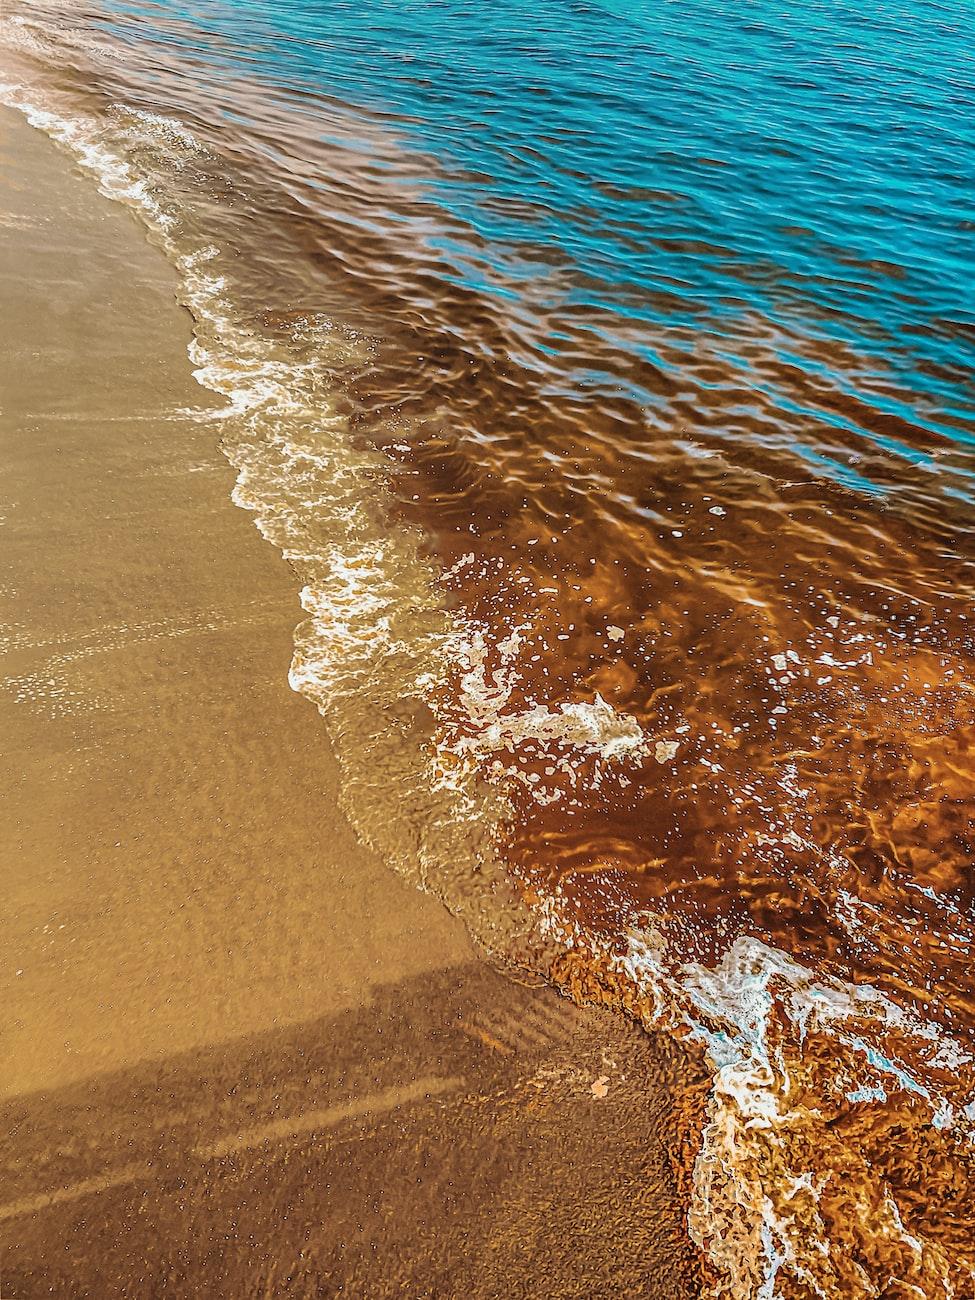 red tide in Virginia Beach